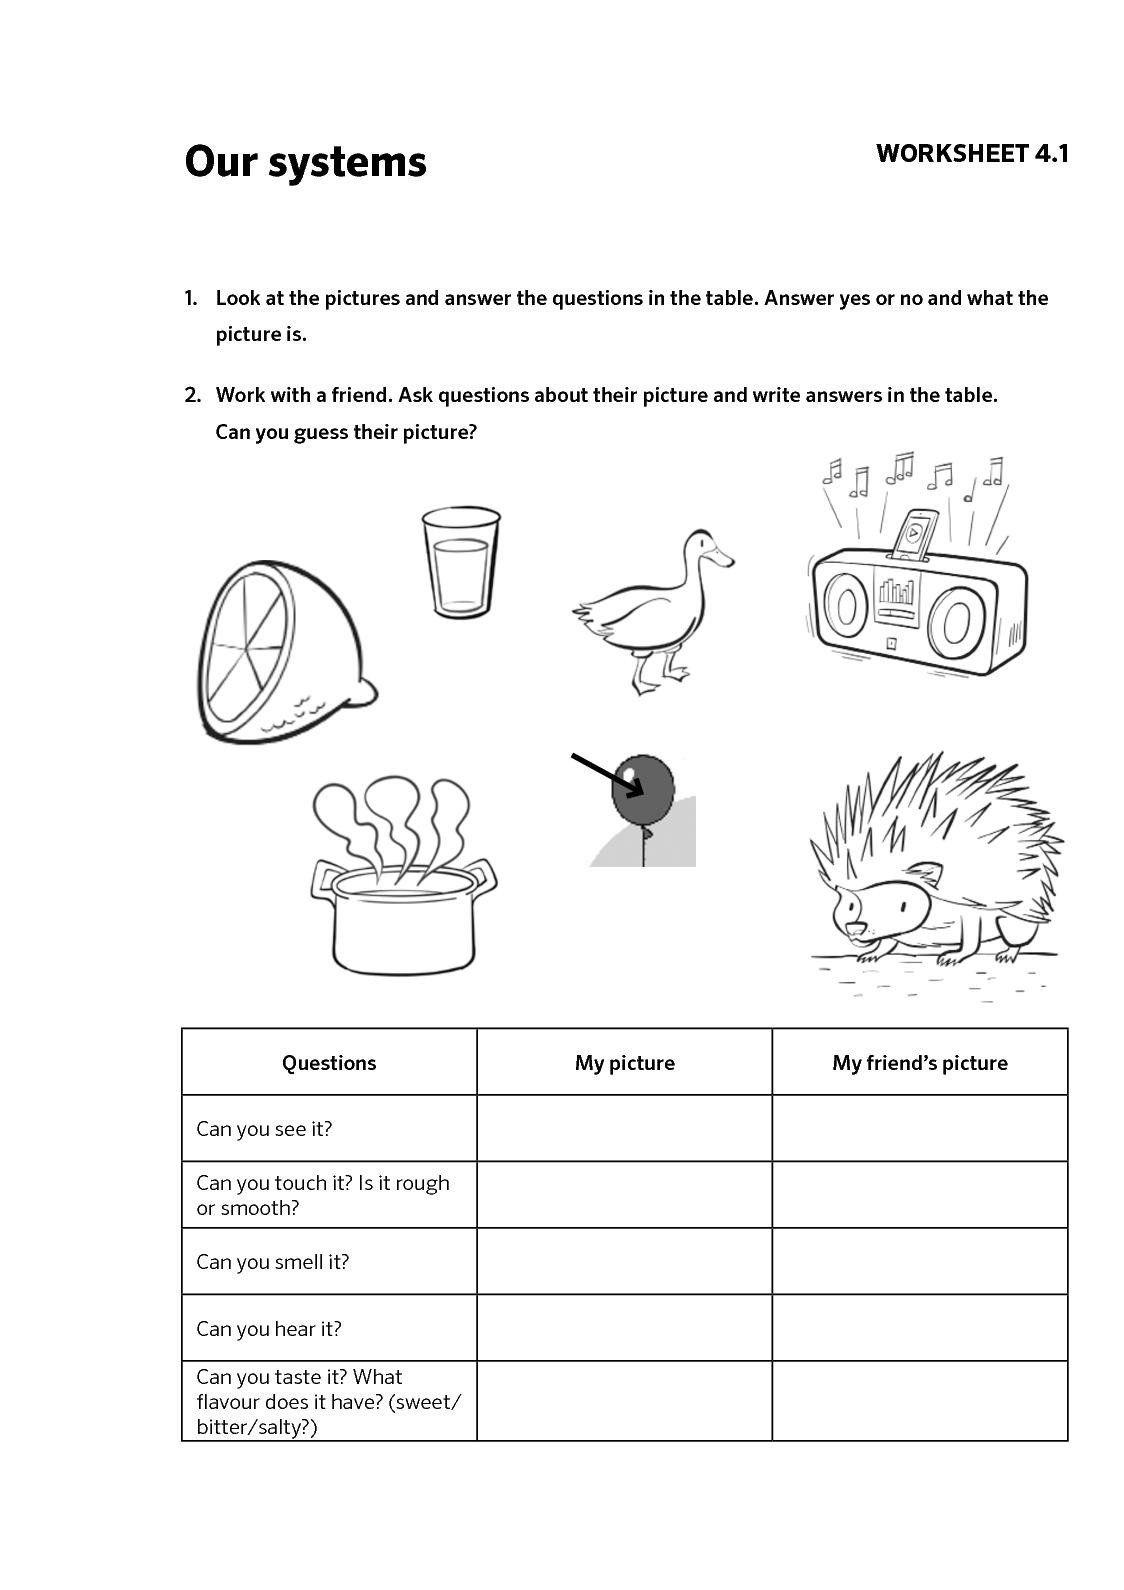 Circulatory System Worksheet Answers Calameo Worksheets Unit 4 Ns 3º Primaria Circulatory System Worksheets Skeletal System Worksheet